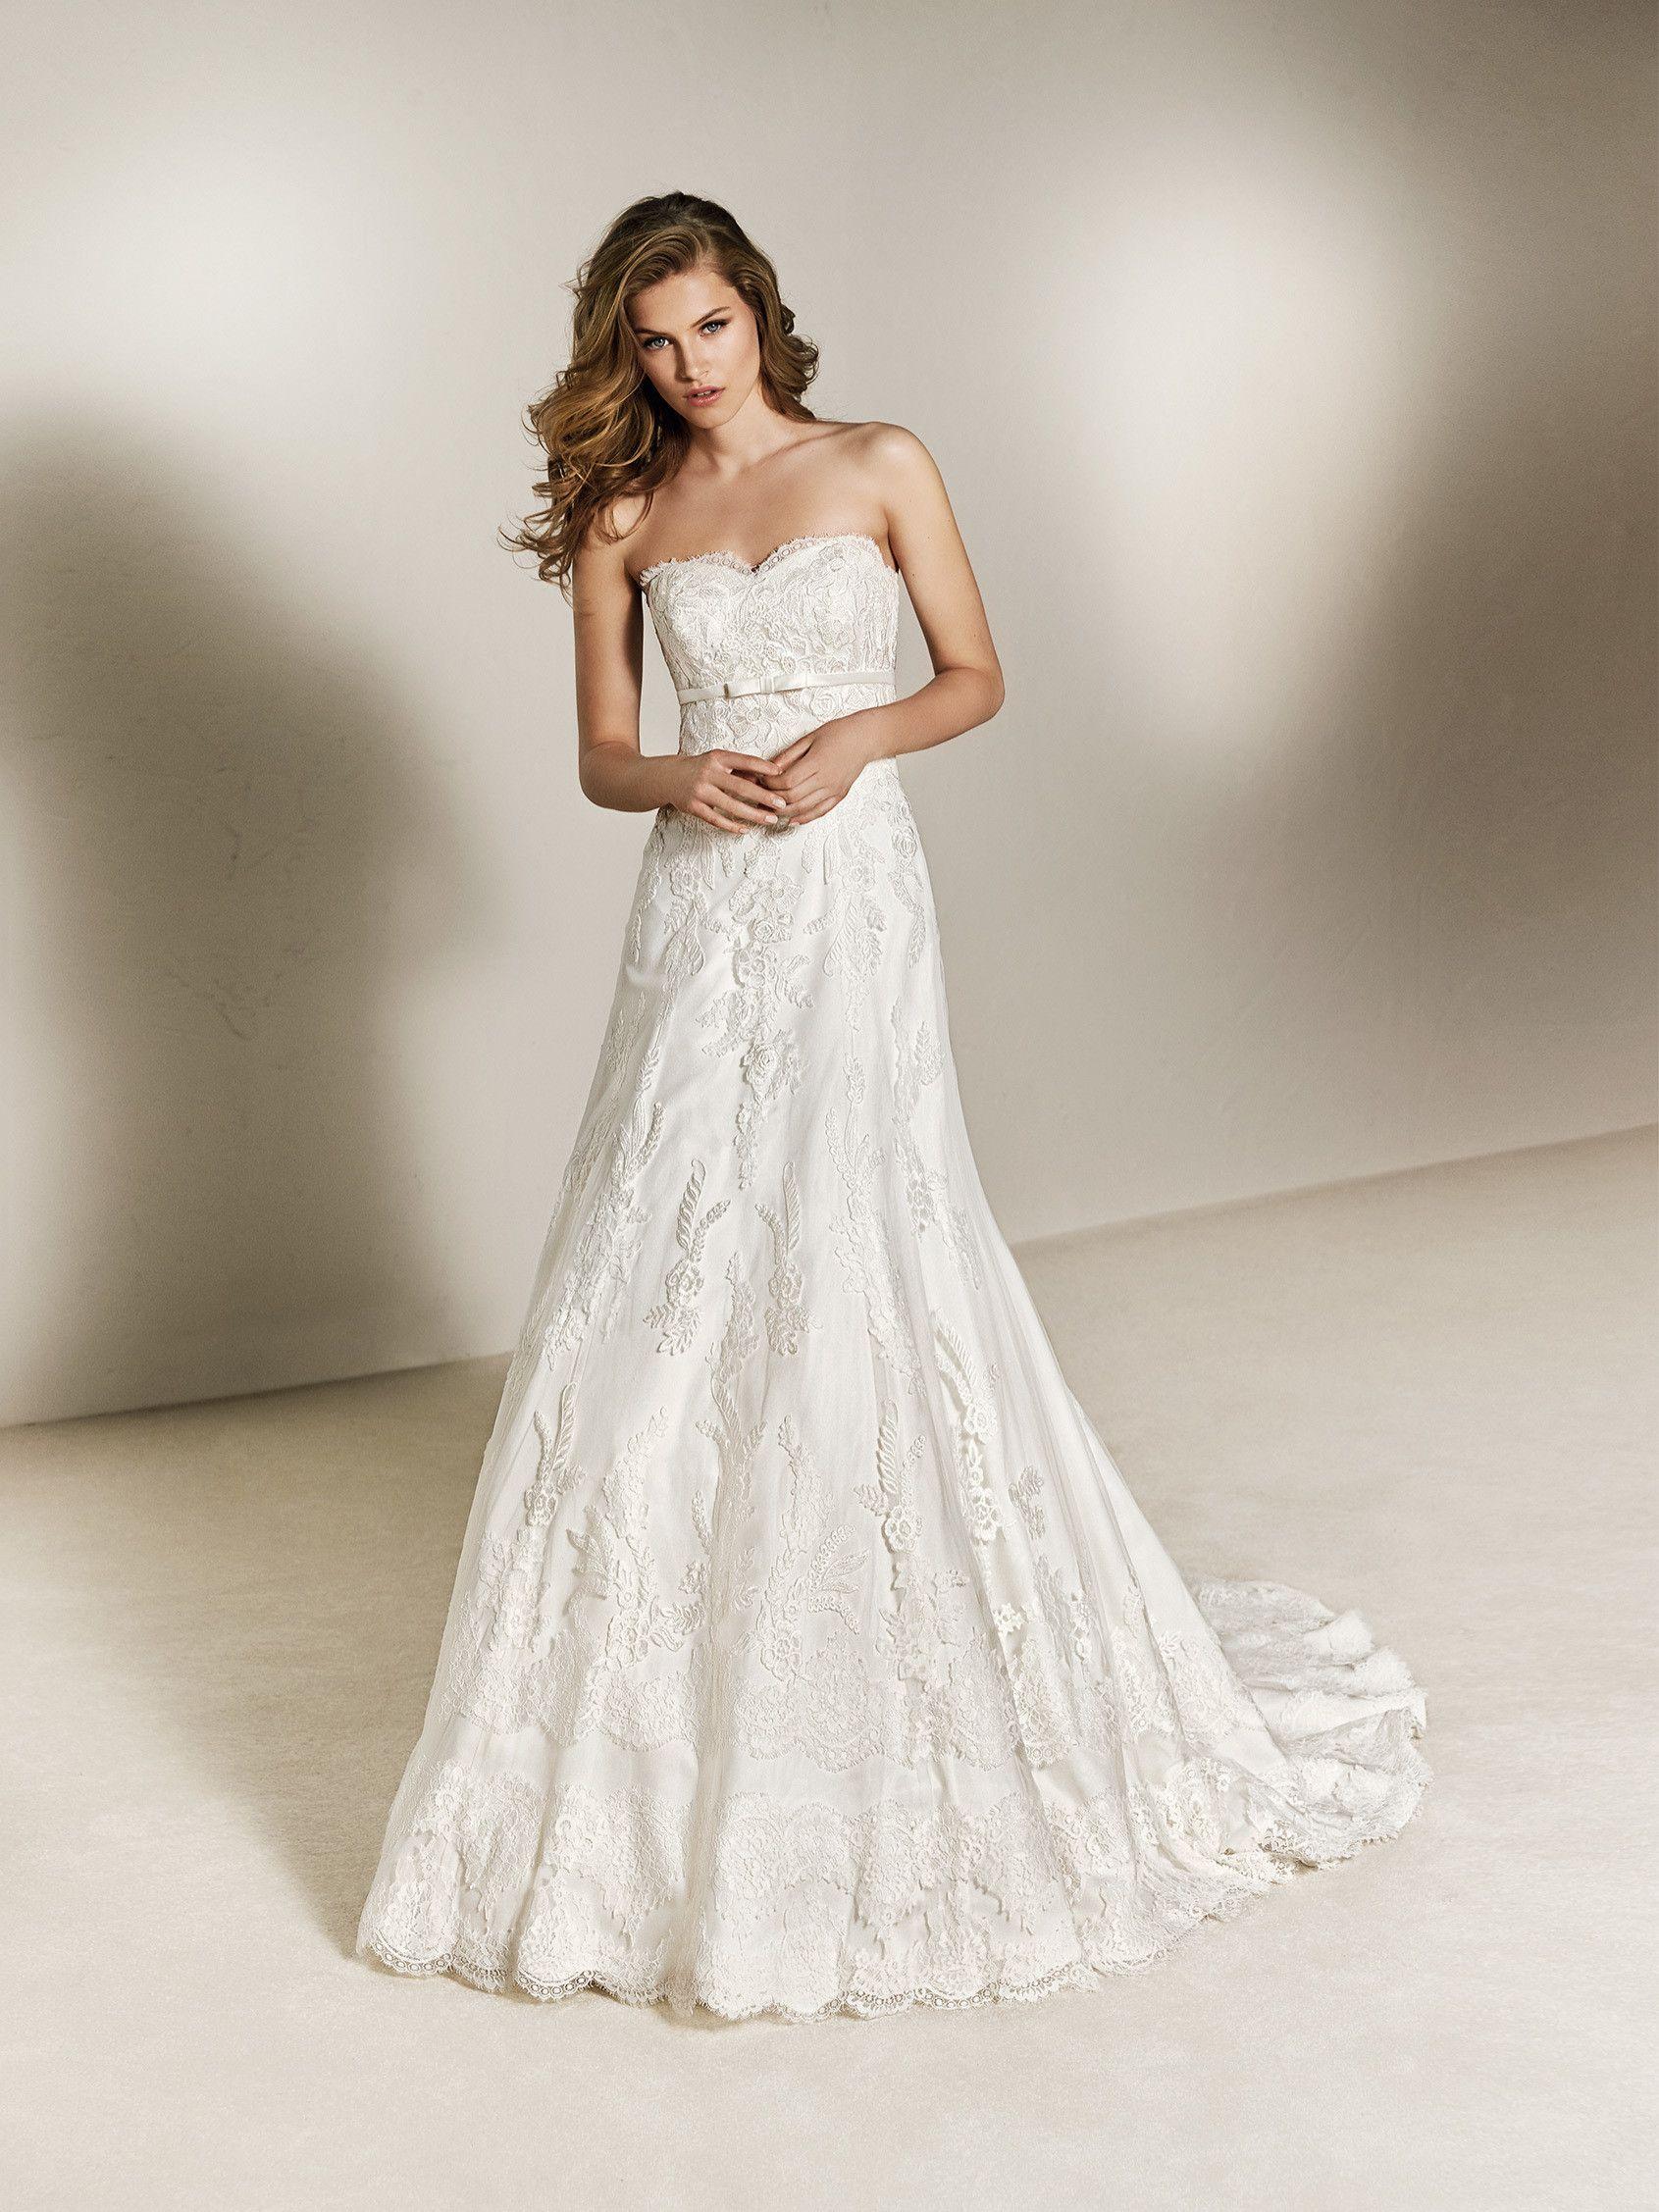 152cf346c Charlene  Vestido de novia princesa con lazo bajo el pecho. Coleccion 2018  Pronovias